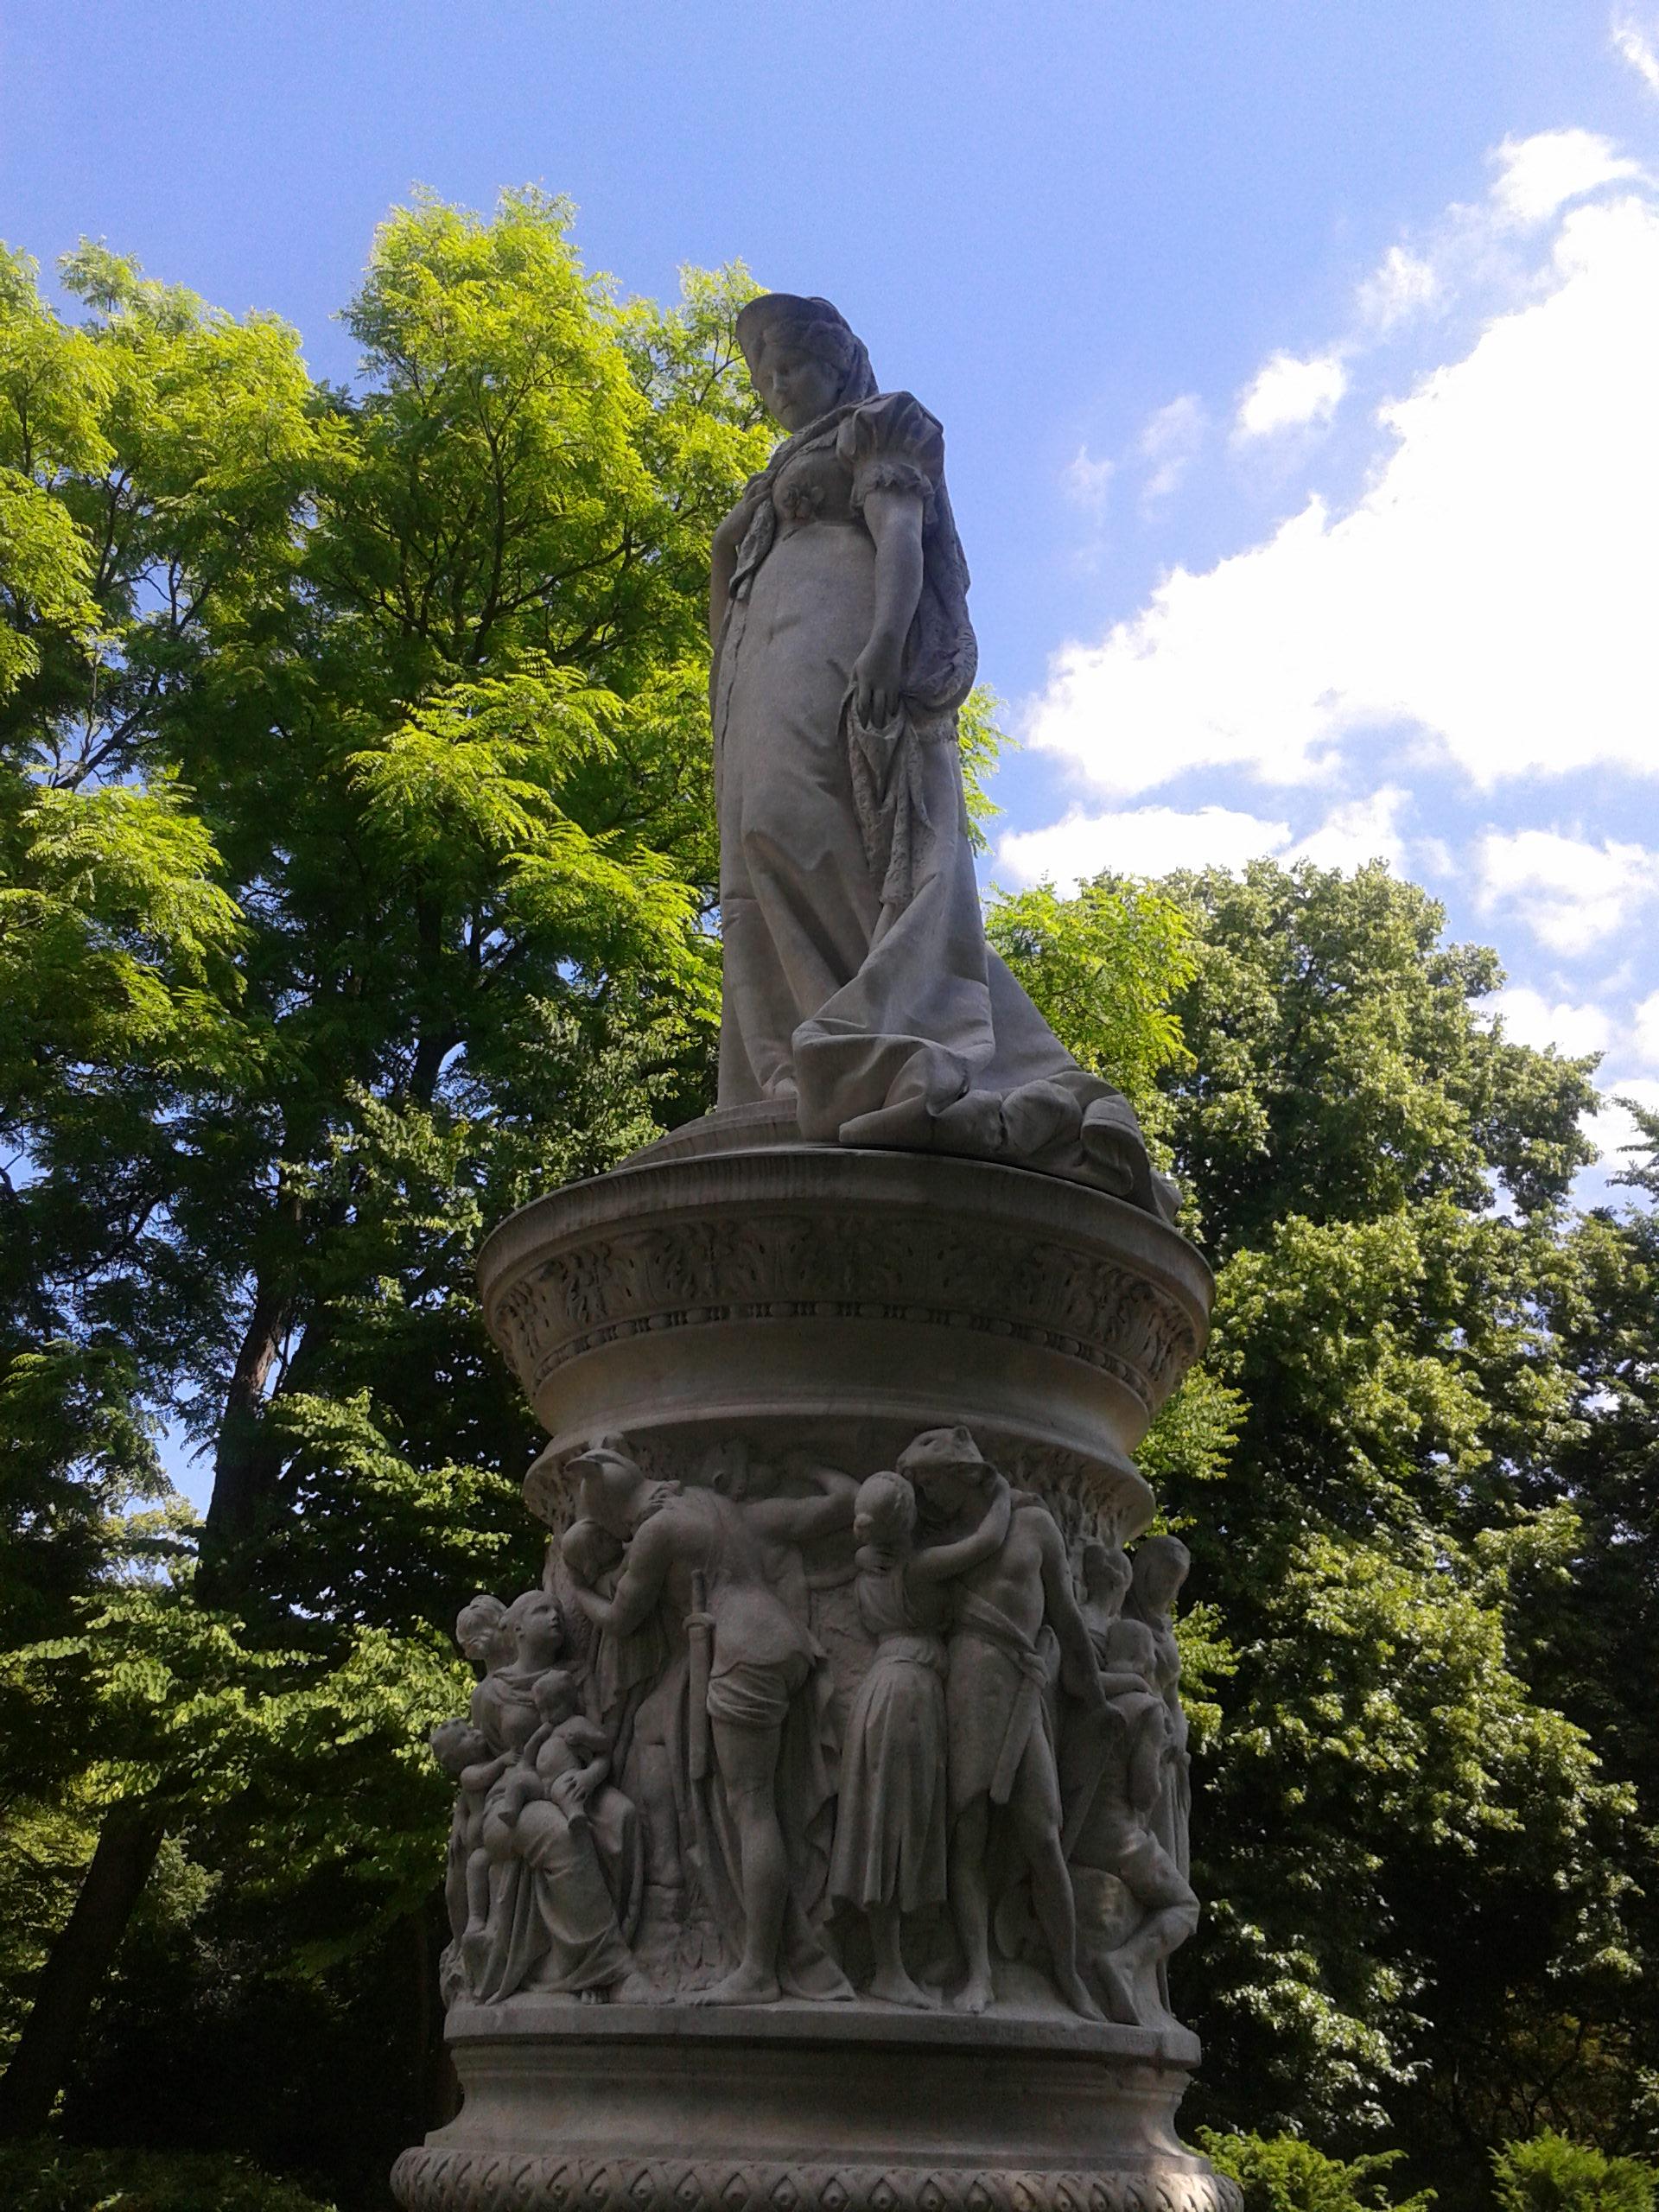 Königin Luise 2014-06-01 13.55.09